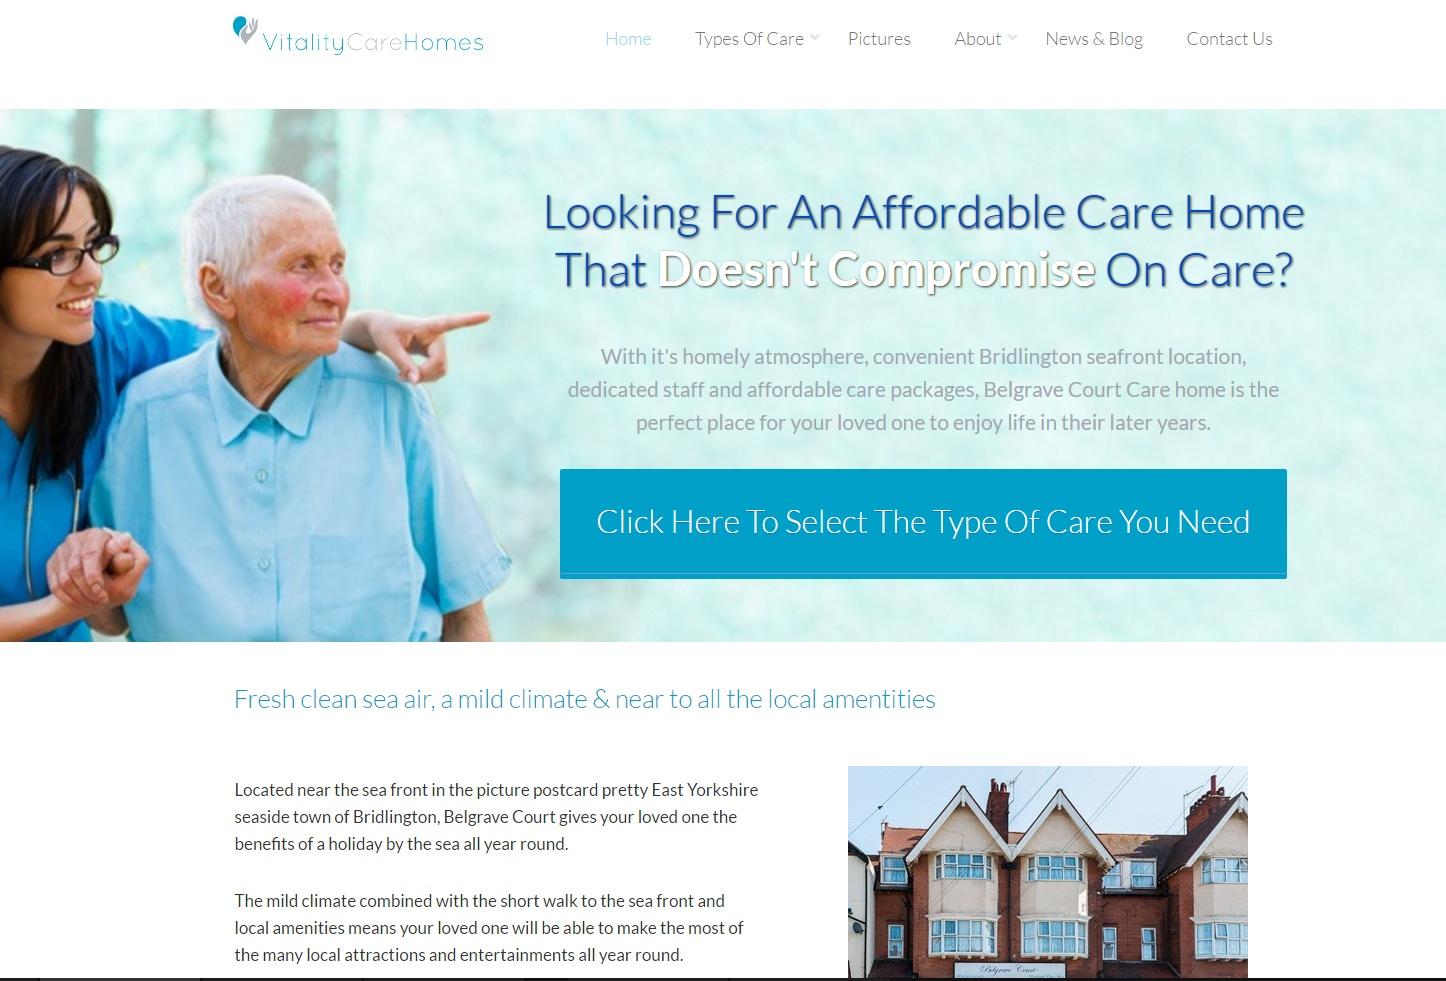 vitality-care-homes